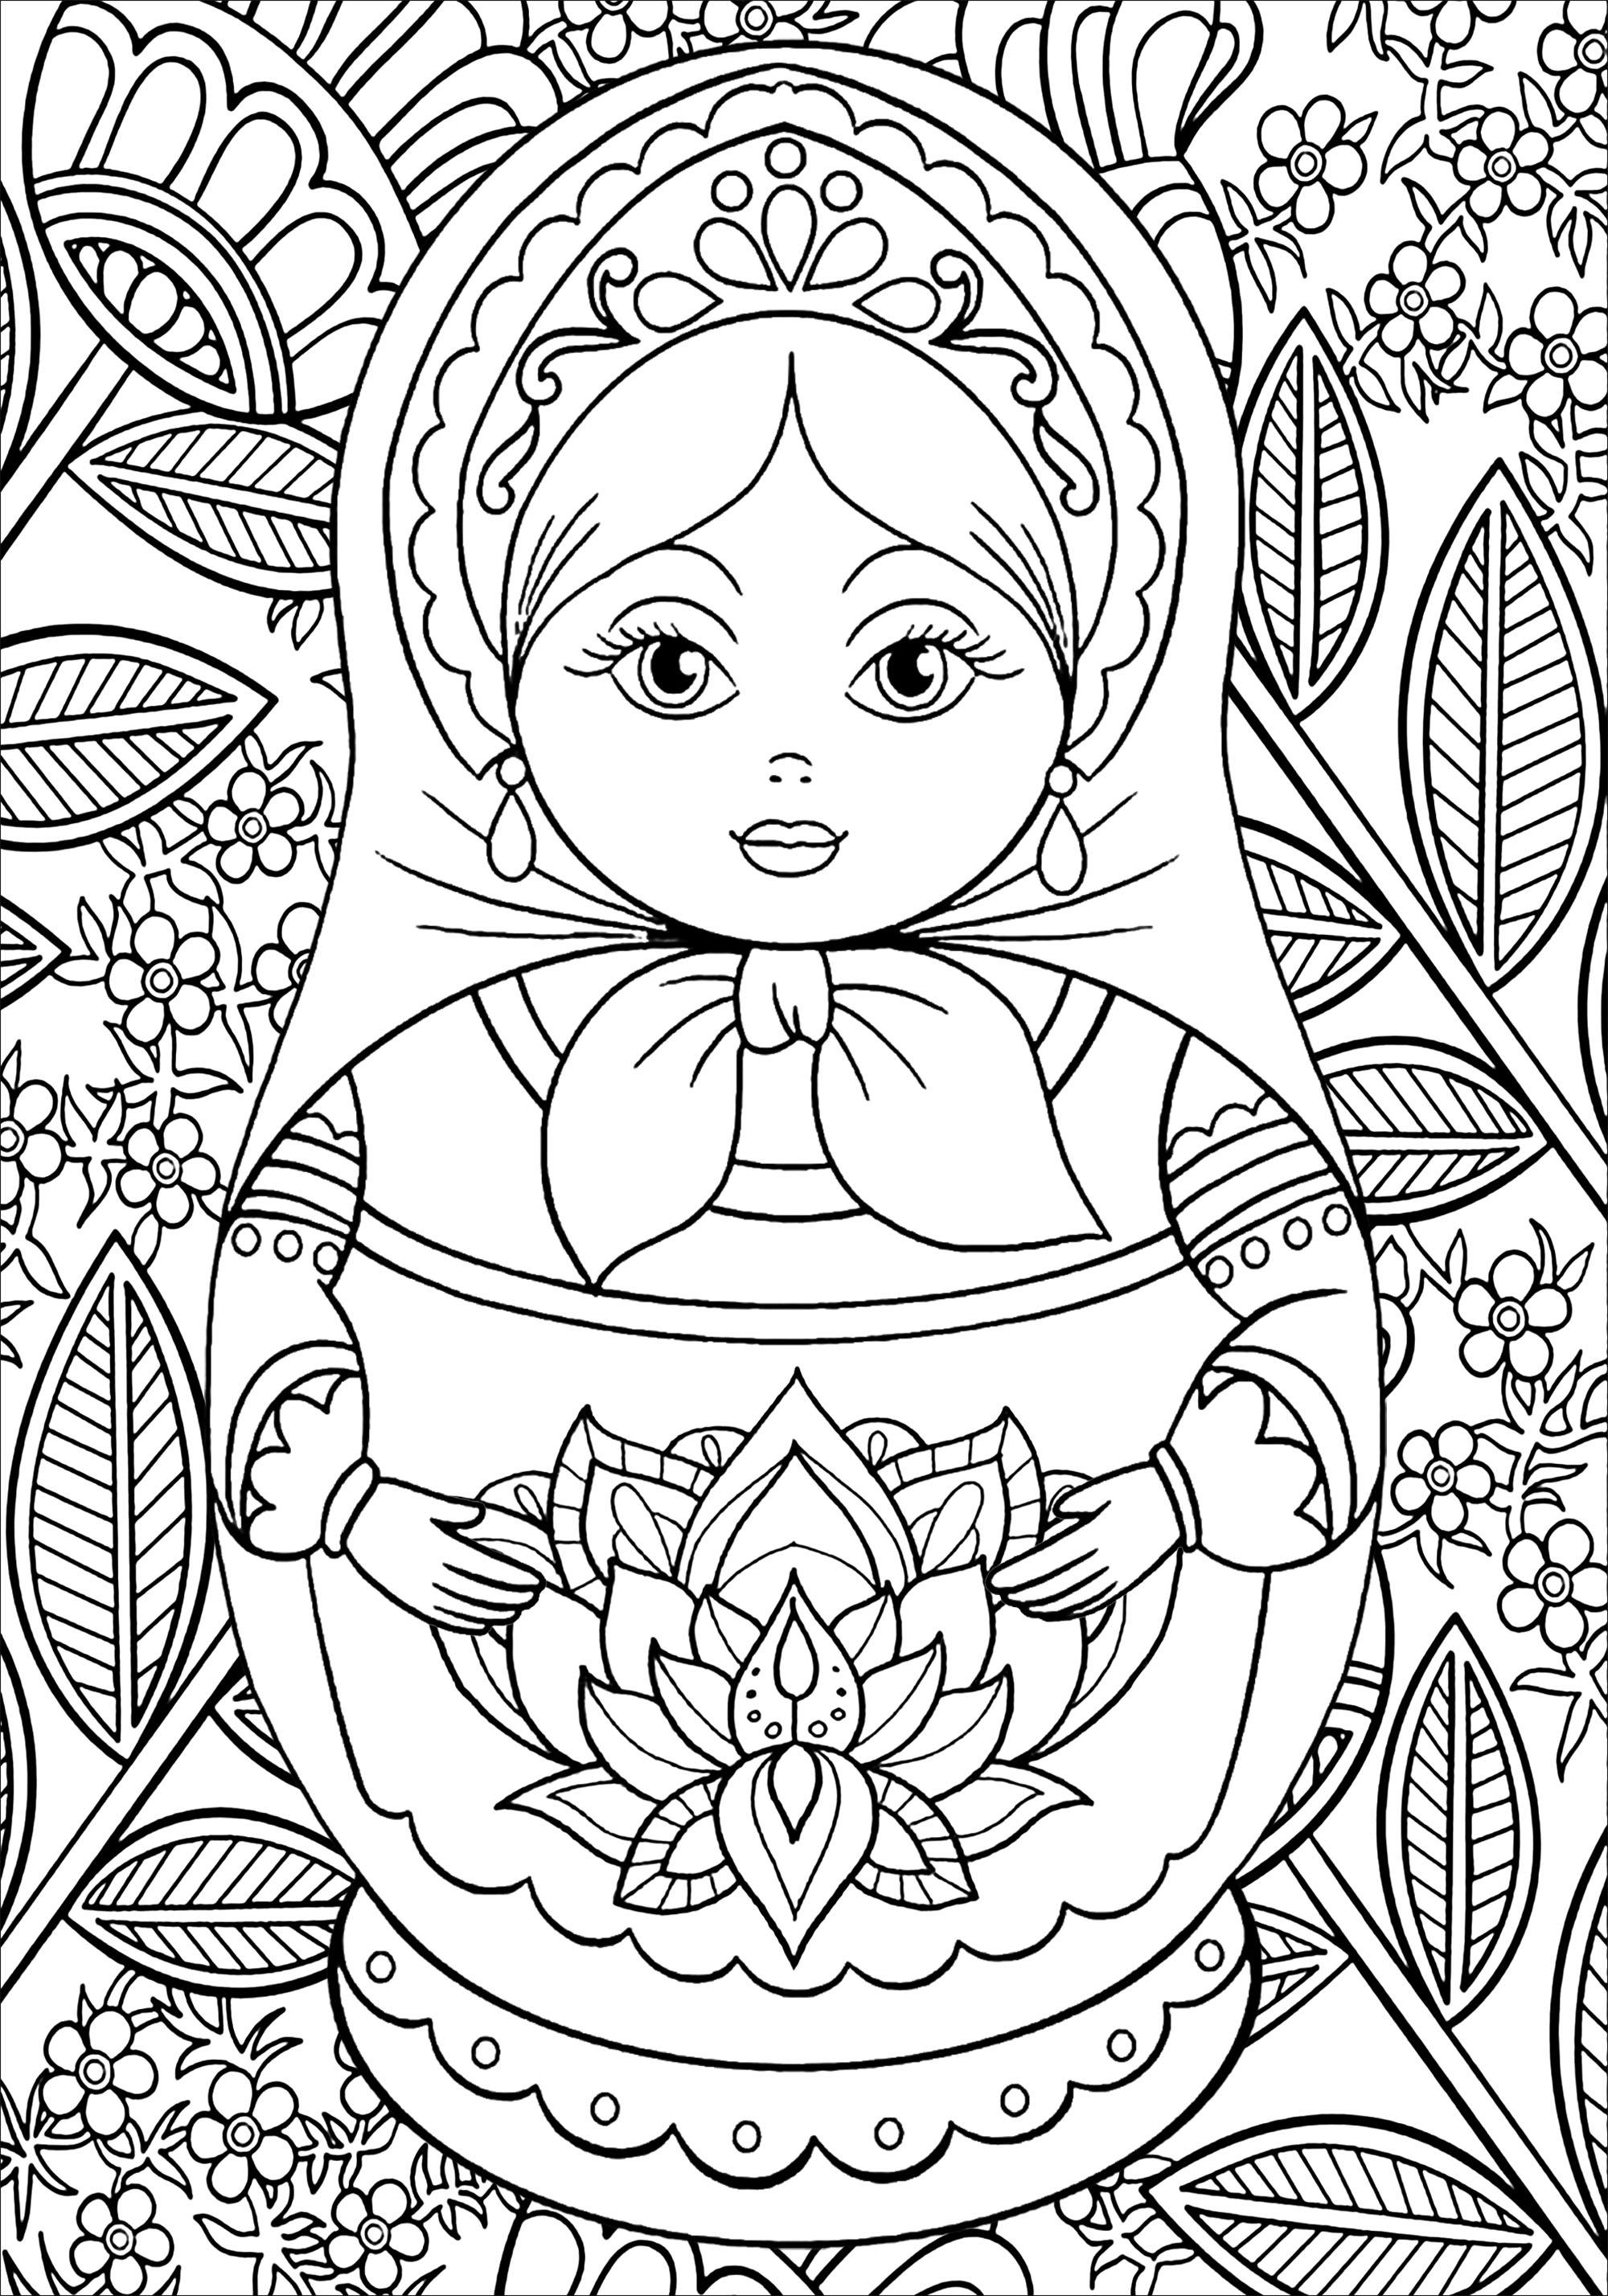 Colorear para Adultos : Muñecas Rusas - 2